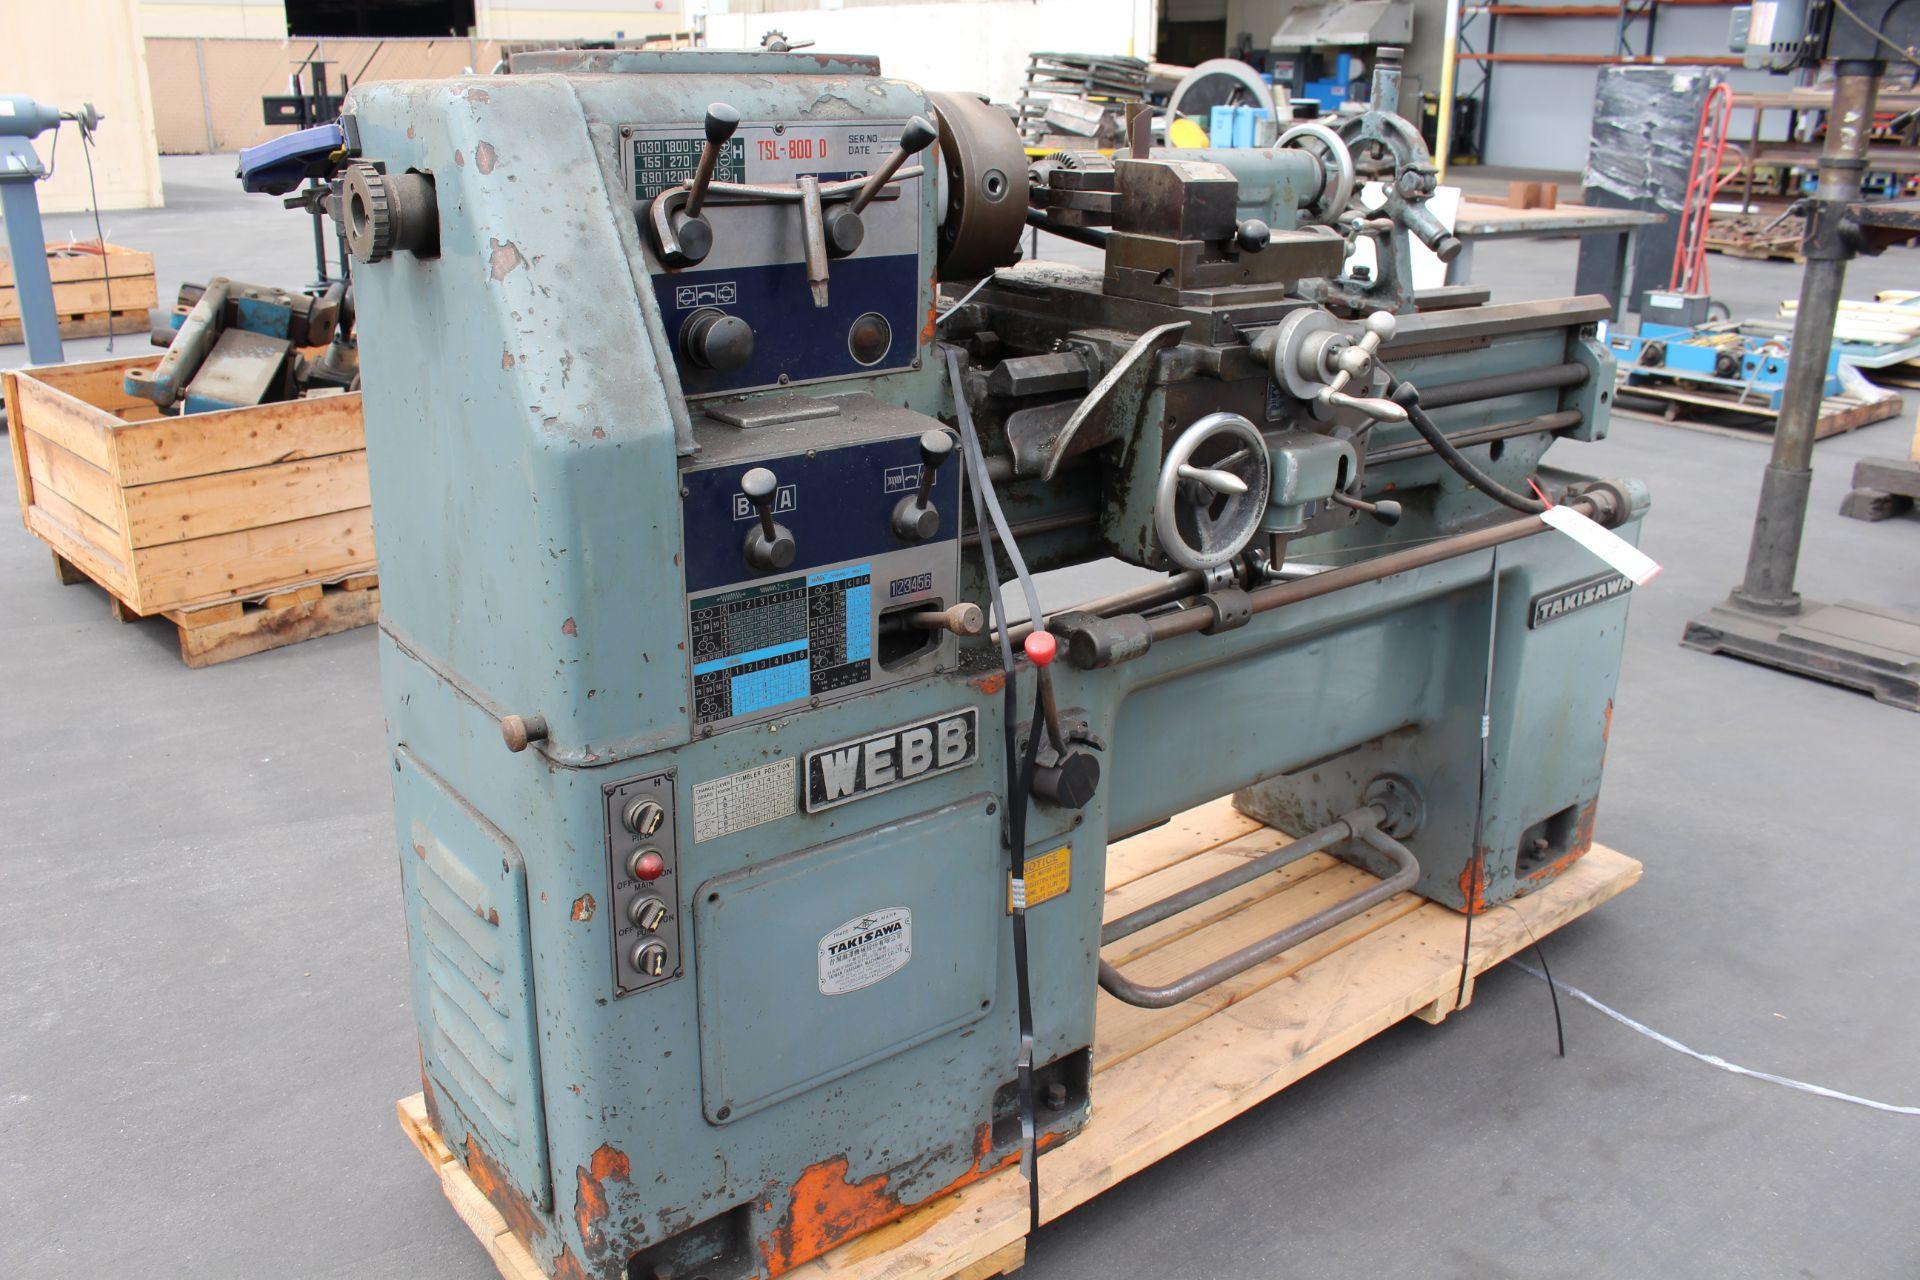 "WEBB TSL-800D LATHE, 55-1800 RPM, 6"" 3-JAW CHUCK, S/N BFE00039H - Image 3 of 3"